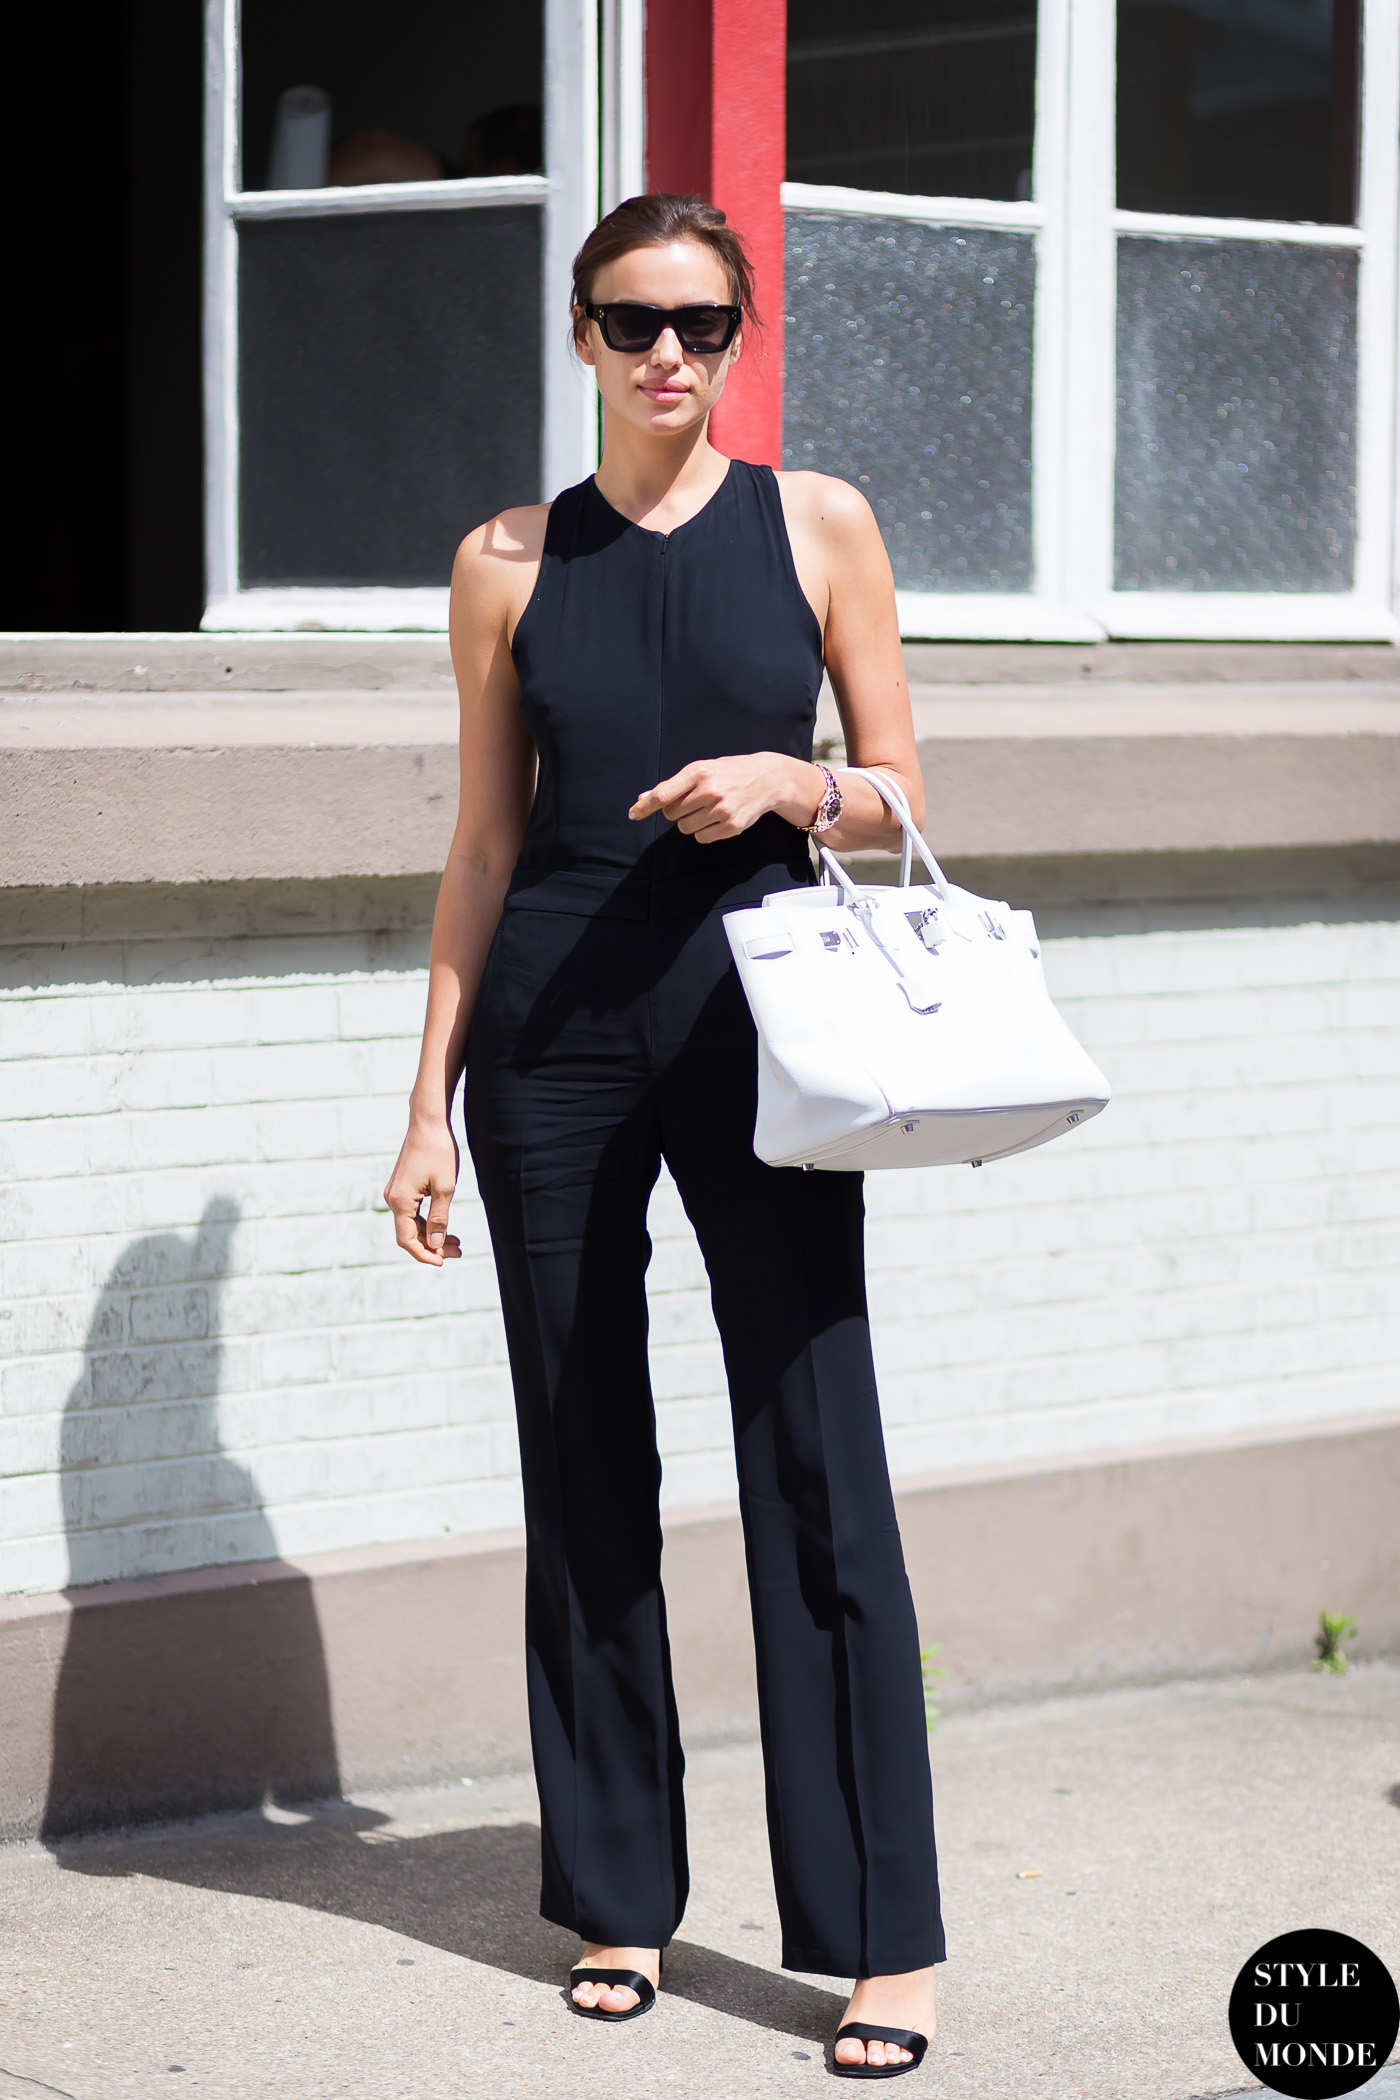 61649b7da4b Irina Shayk Street Style Street Fashion by STYLEDUMONDE Street Style  Fashion Blog